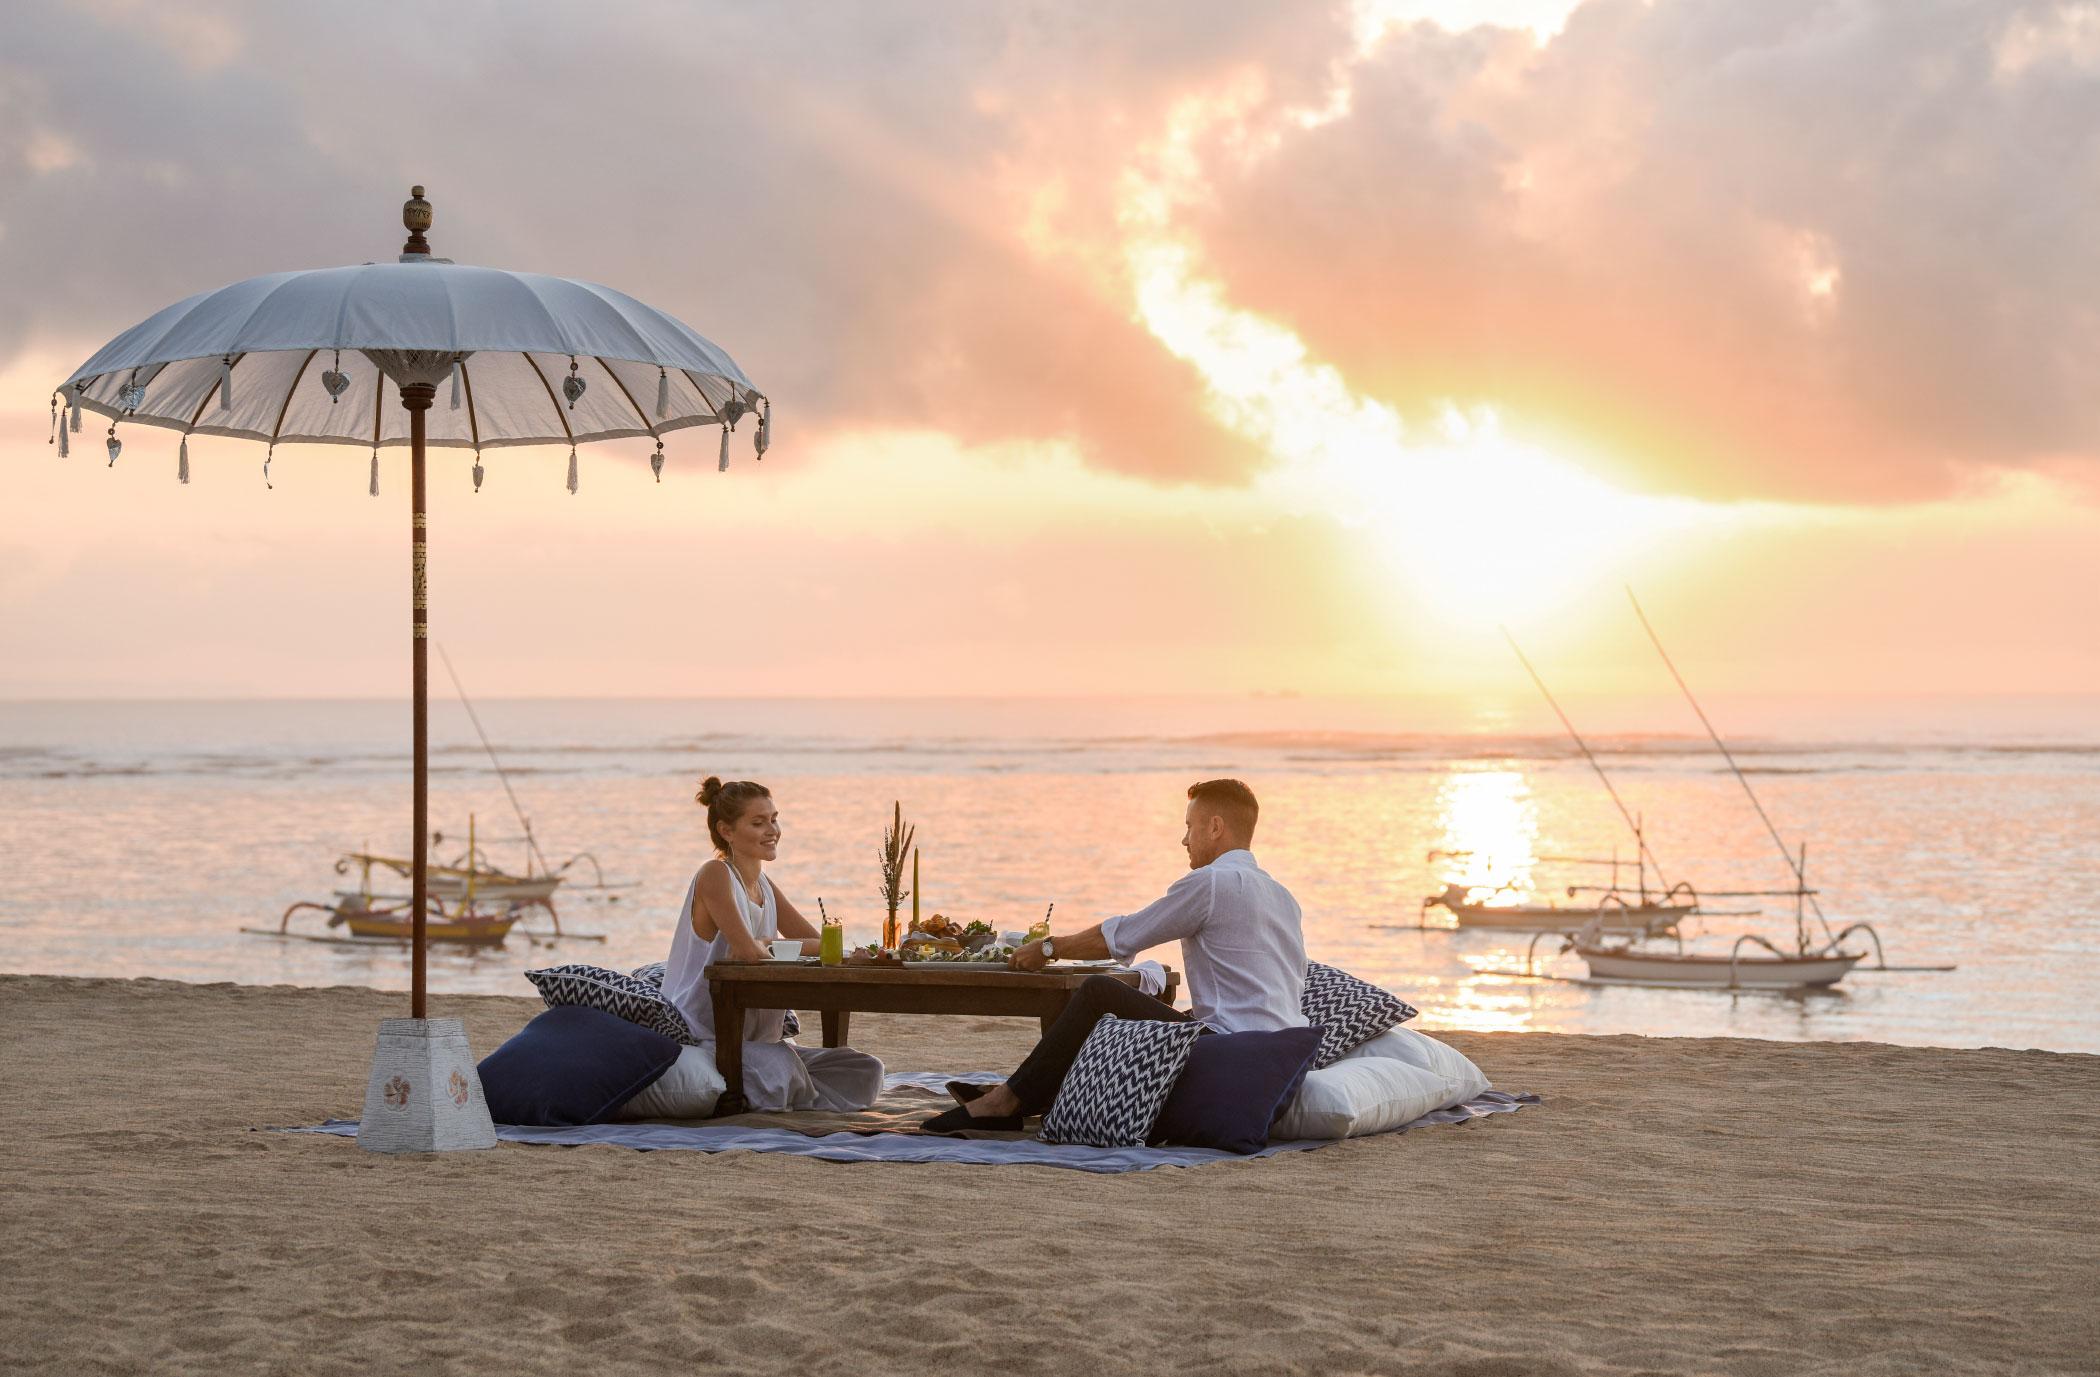 STR_DPSXR_Sunrise_Picnic_on_the-beach_01